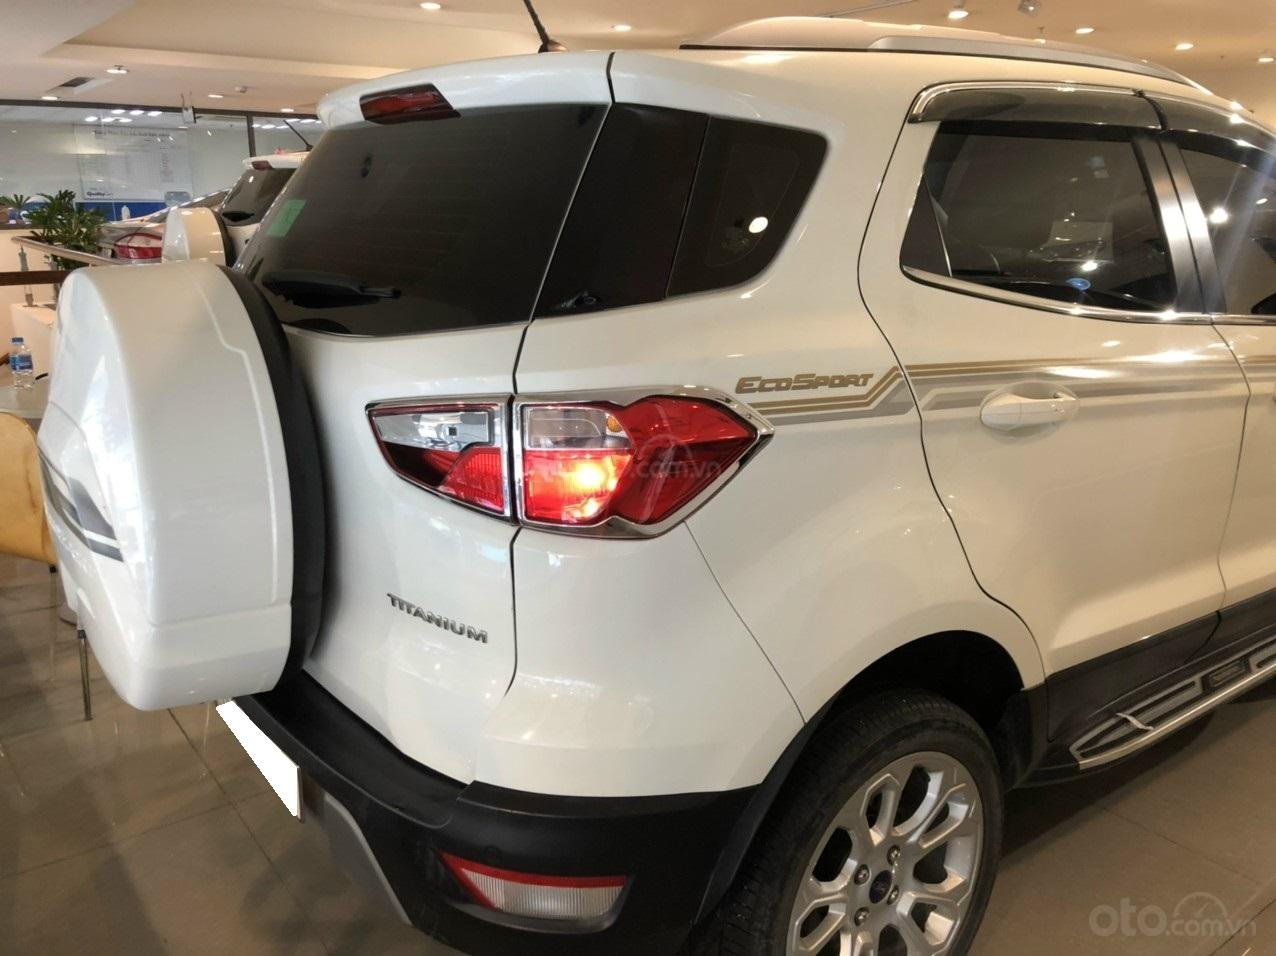 Ecosport Titanium 219 trắng xe đẹp cho mọi người (9)